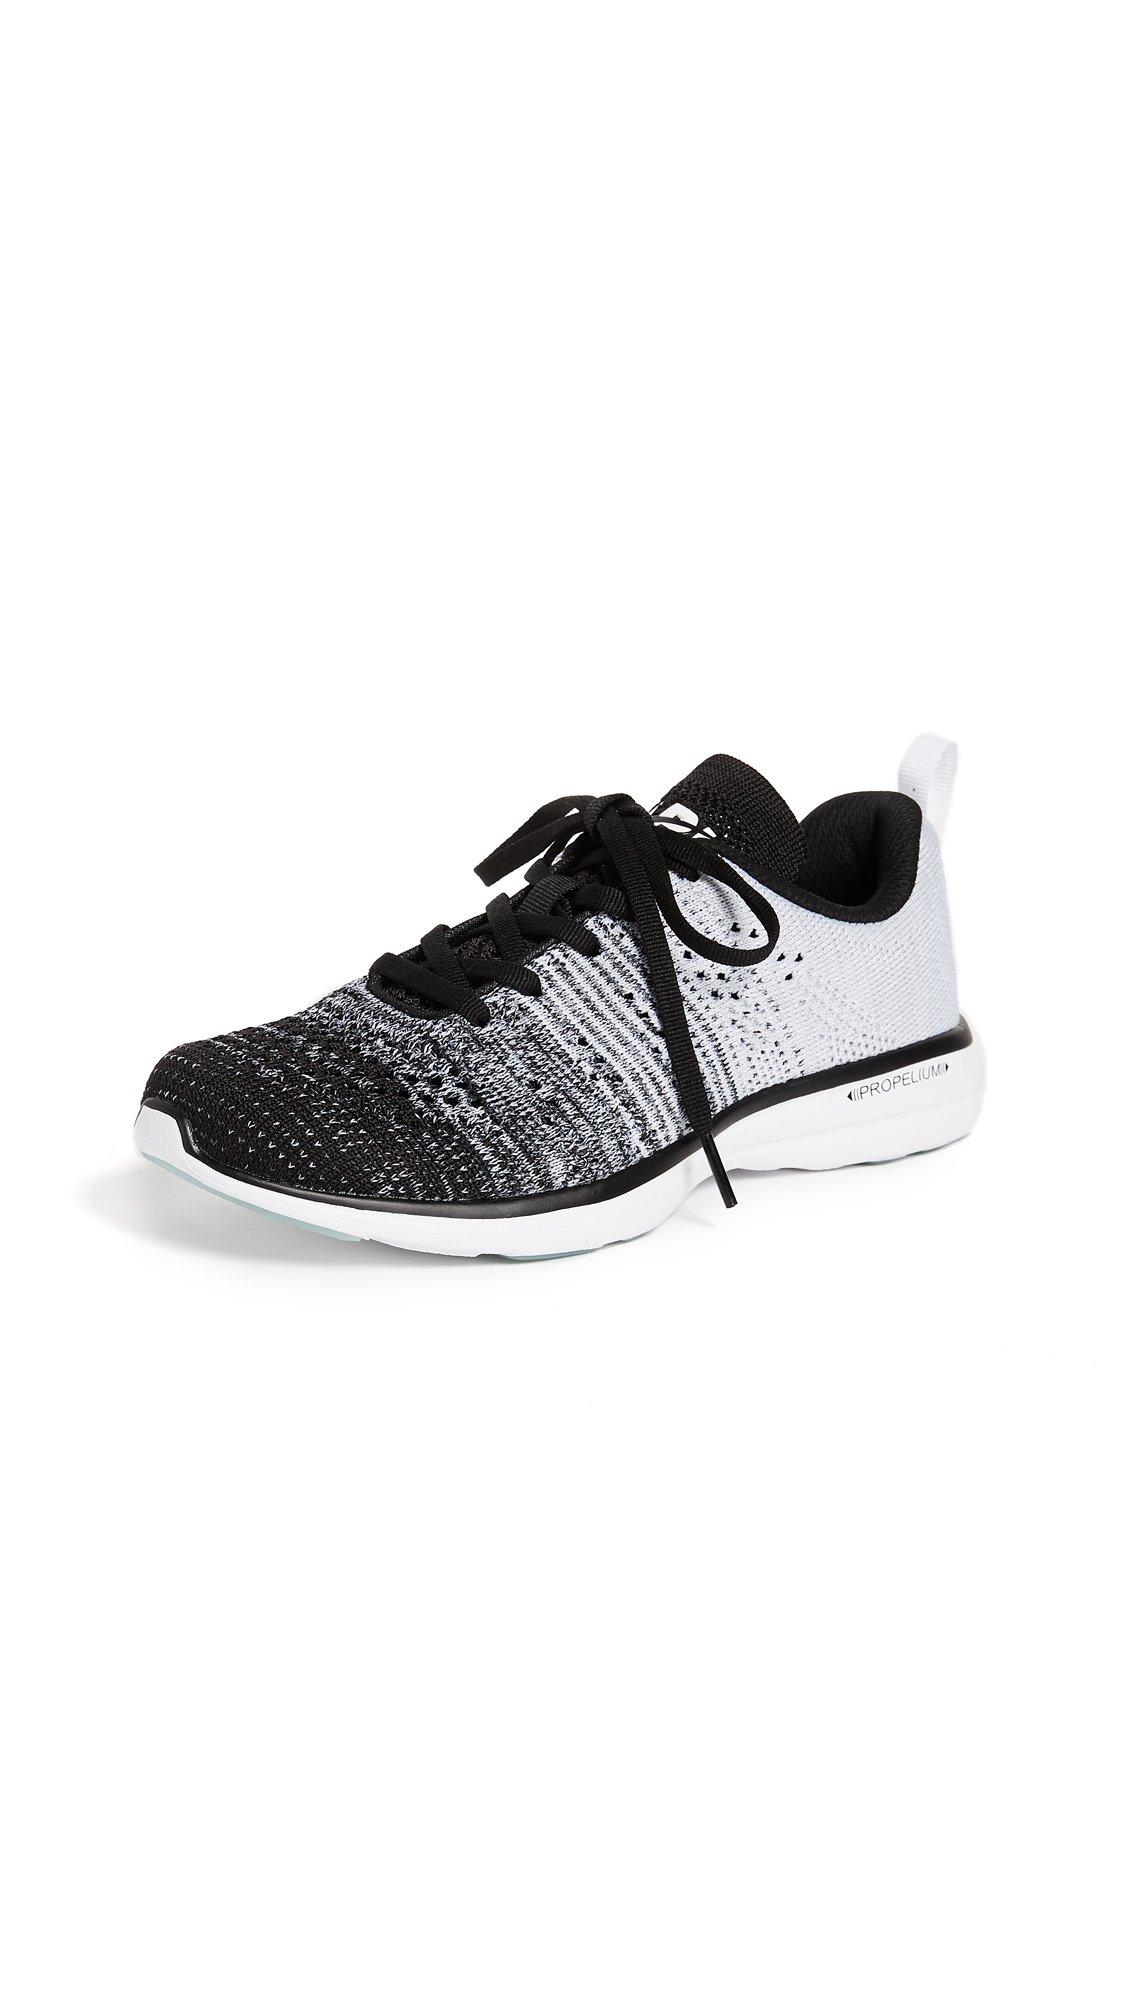 APL: Athletic Propulsion Labs Women's TechLoom Pro Sneakers, Black/Heather Grey/White, 7.5 B(M) US